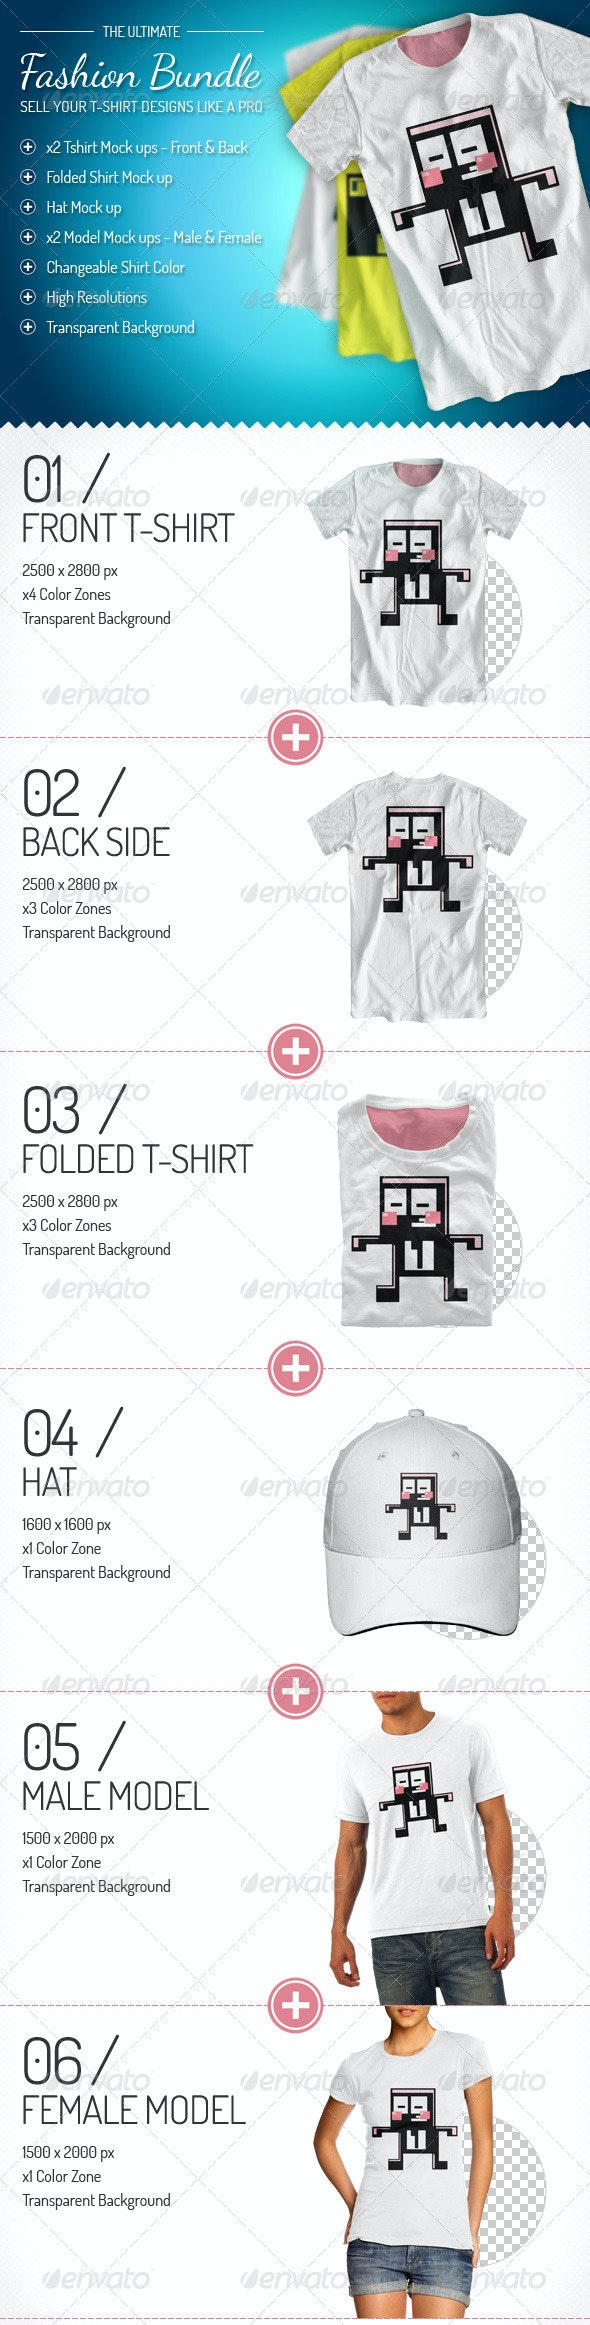 Fashion Bundle - x3 T-shirt / x2 Models / Hat - T-shirts Apparel